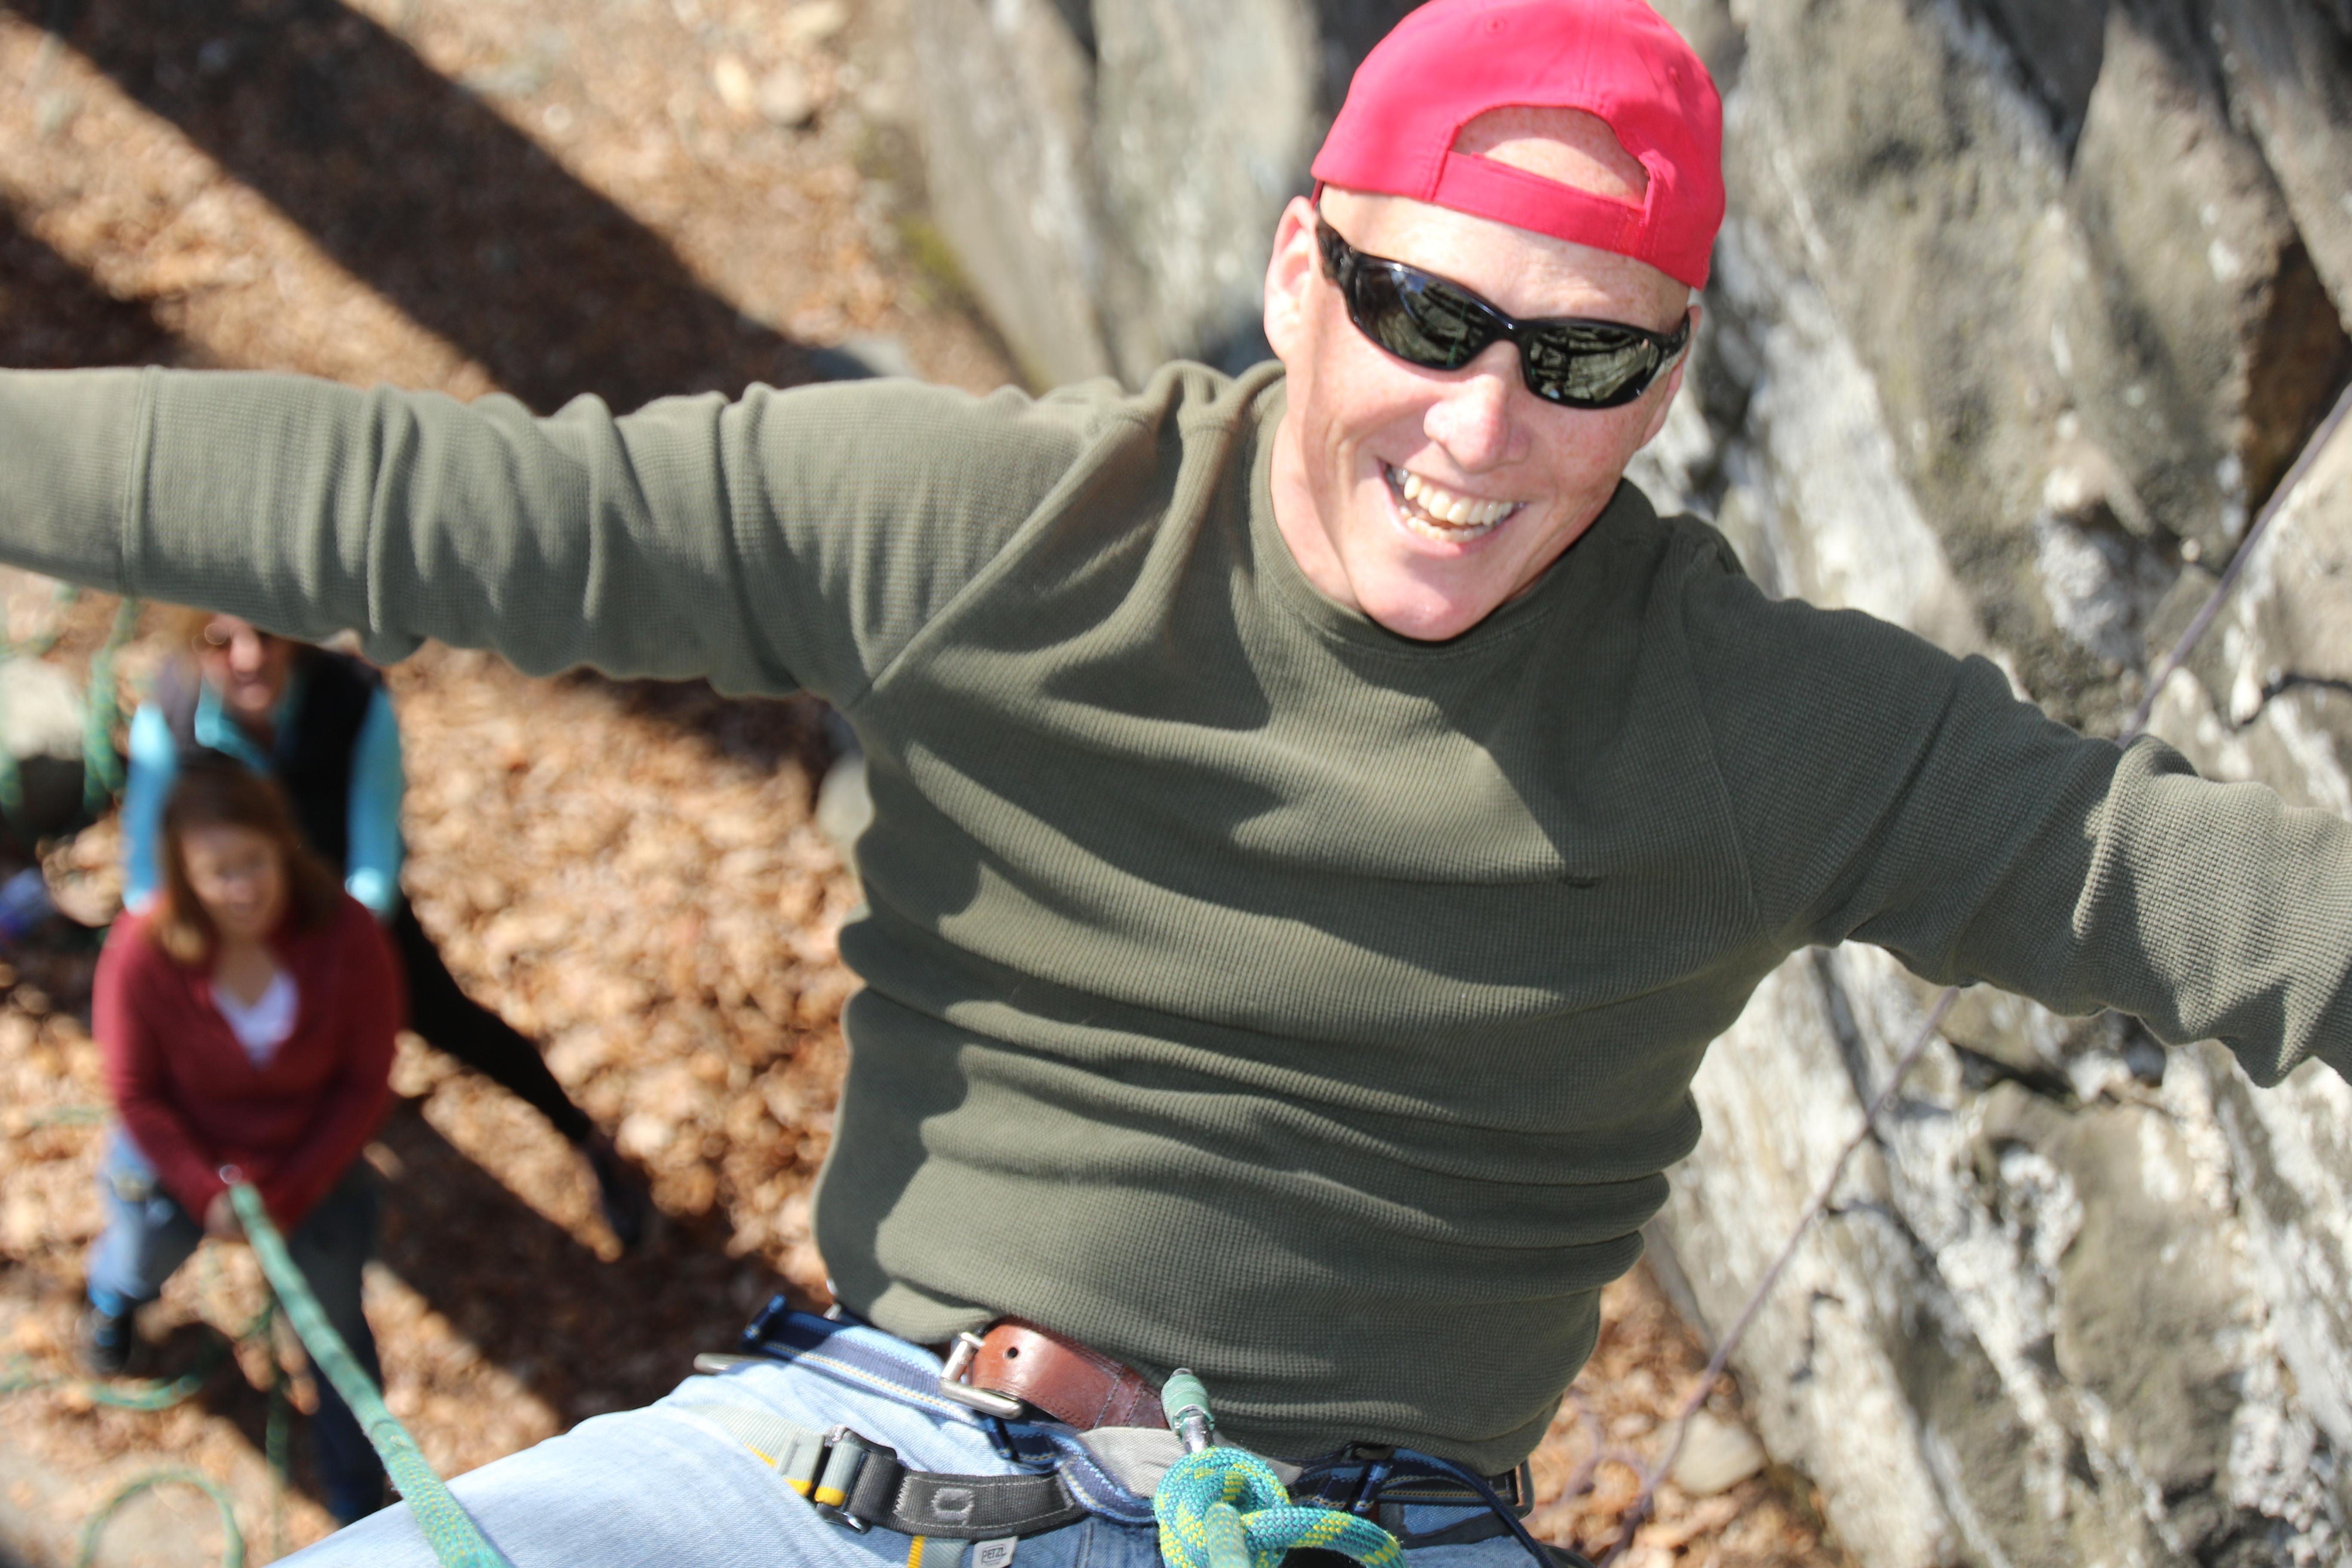 Pams Bday Climb 4-2-17 (101).JPG